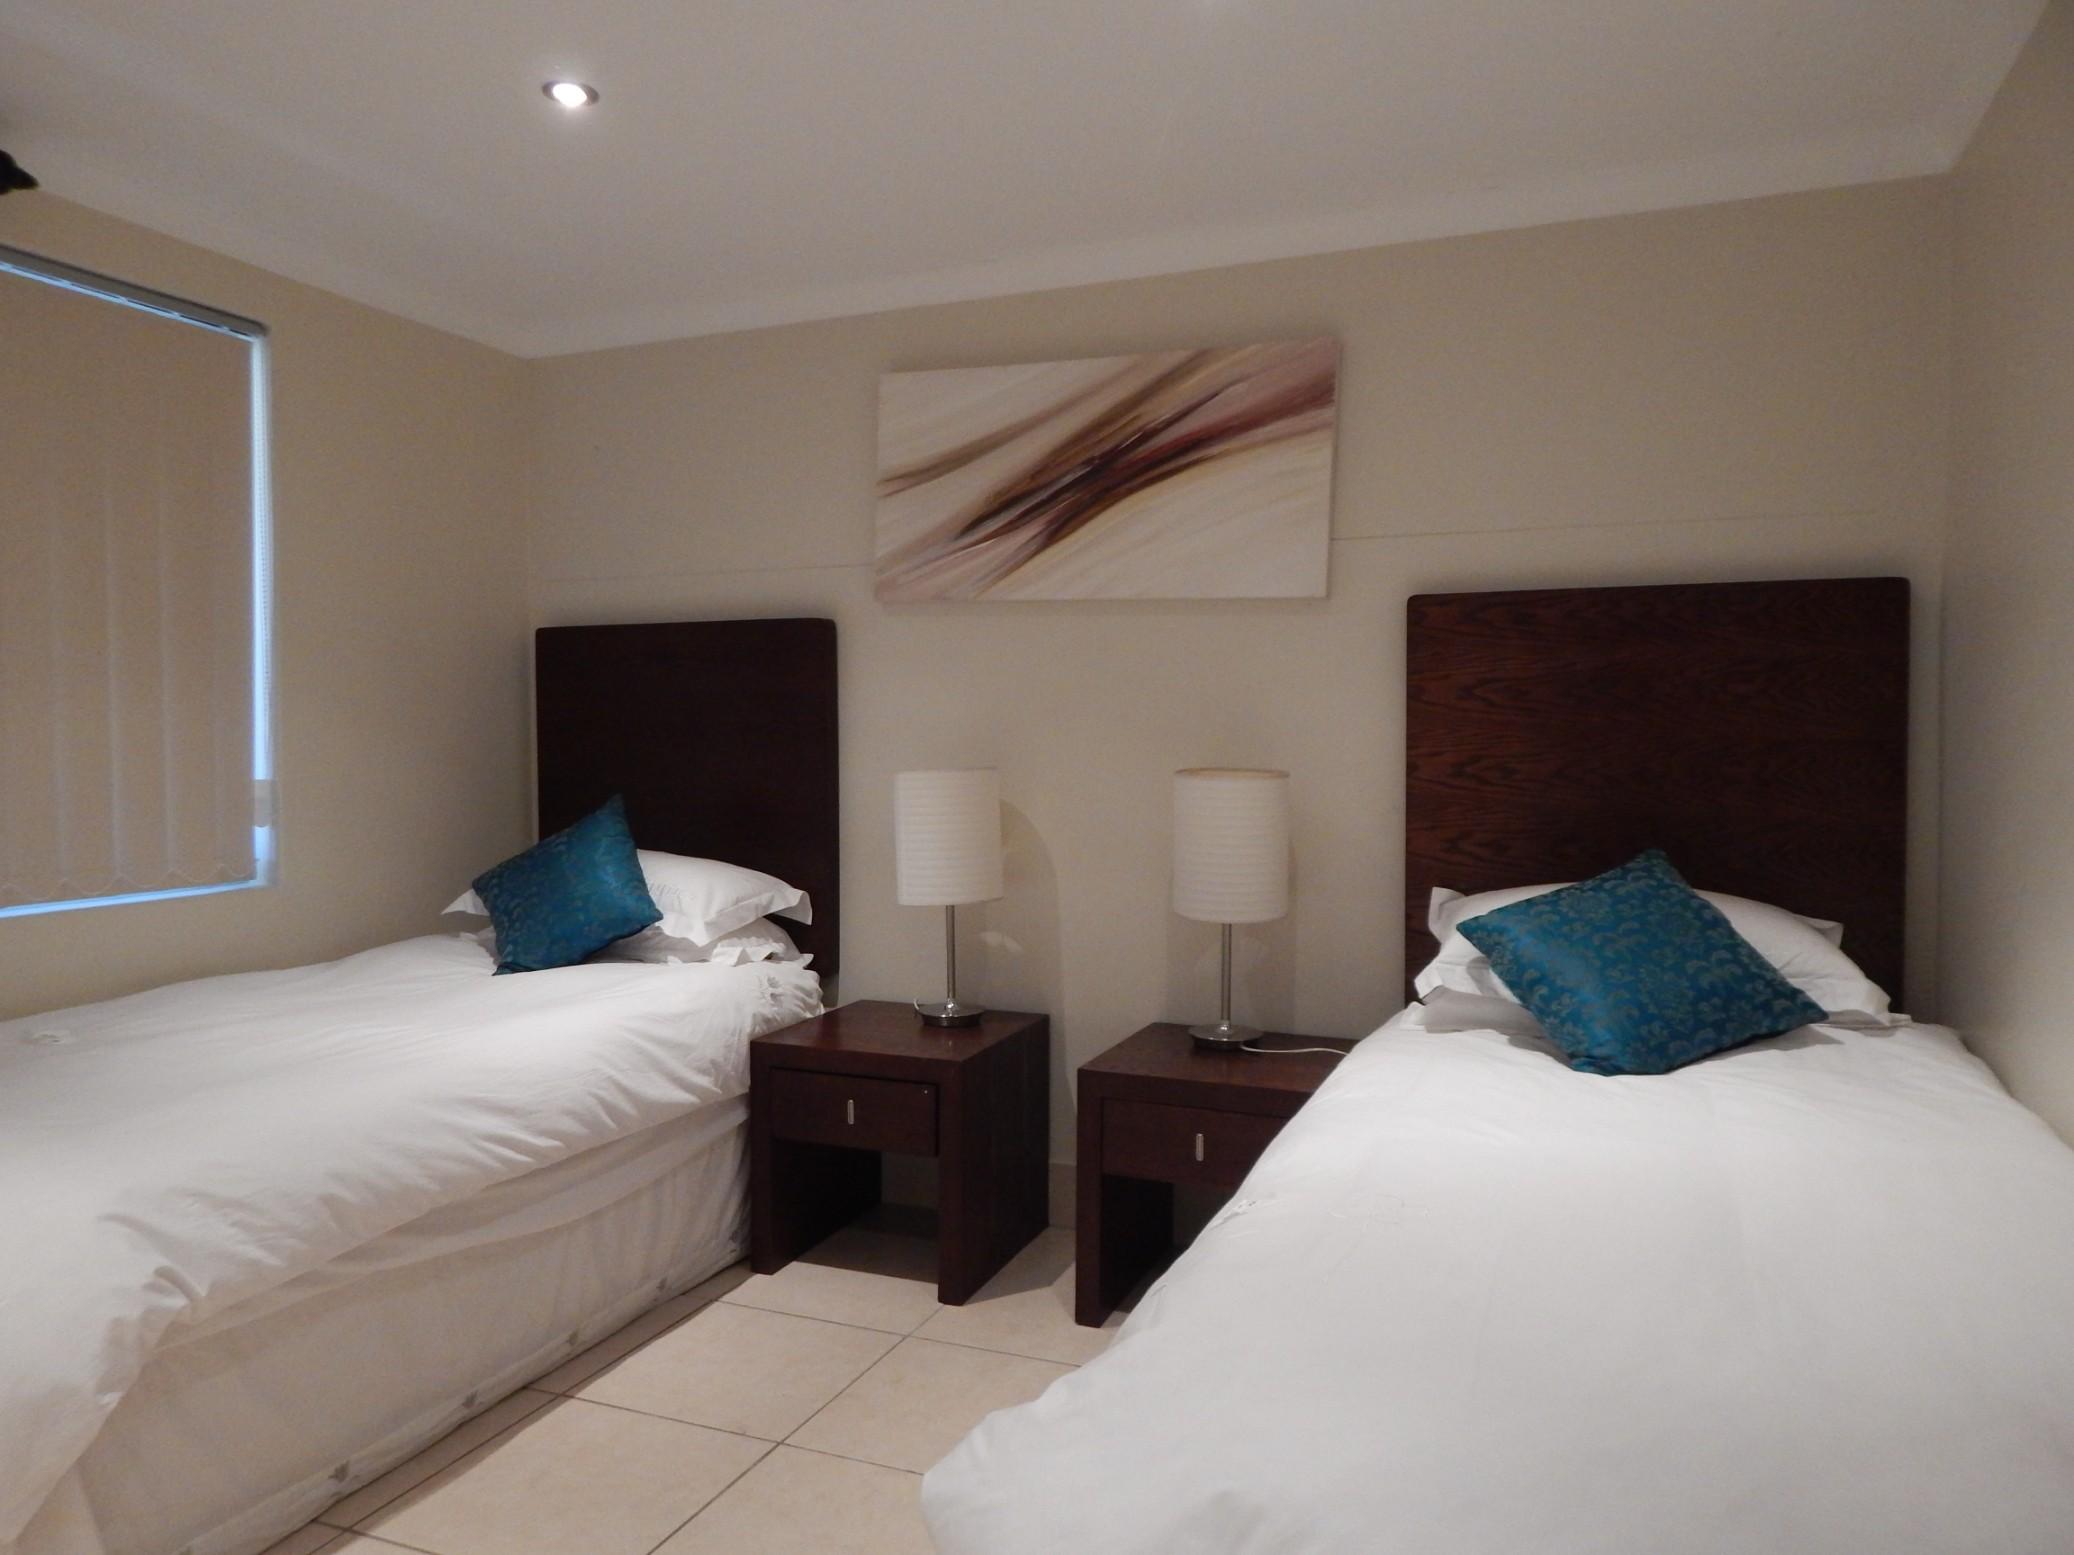 2 Bedroom Apartment for sale in De Bakke ENT0067862 : photo#10